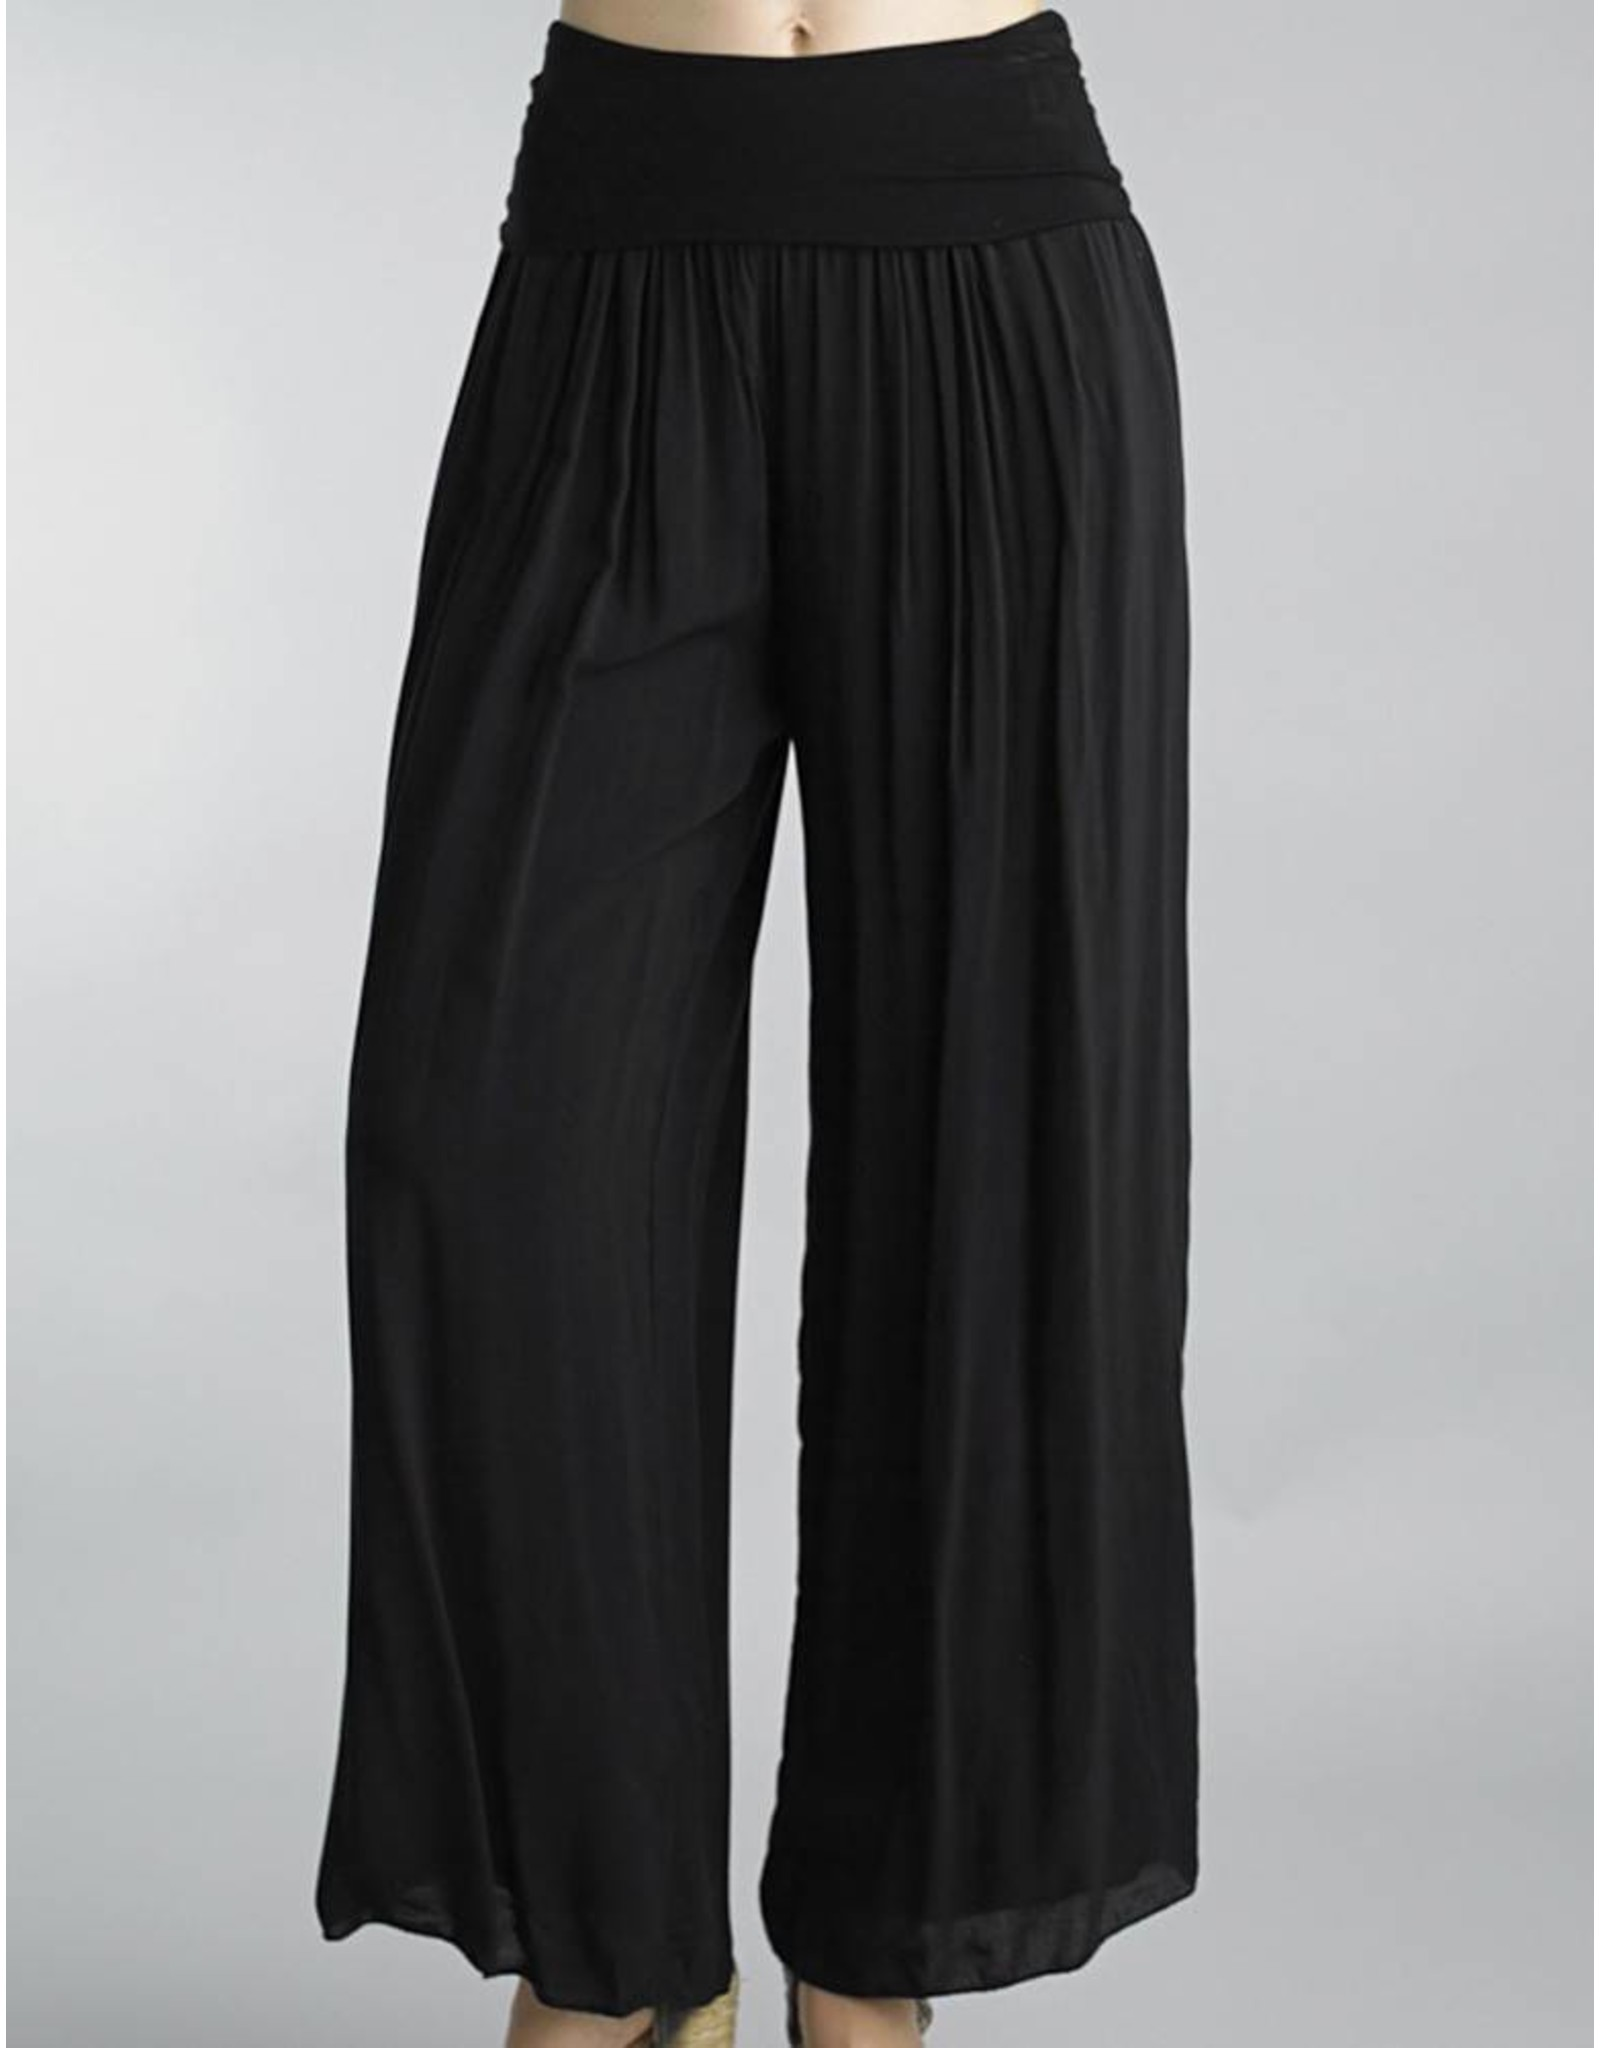 Black Silk Lined Pants